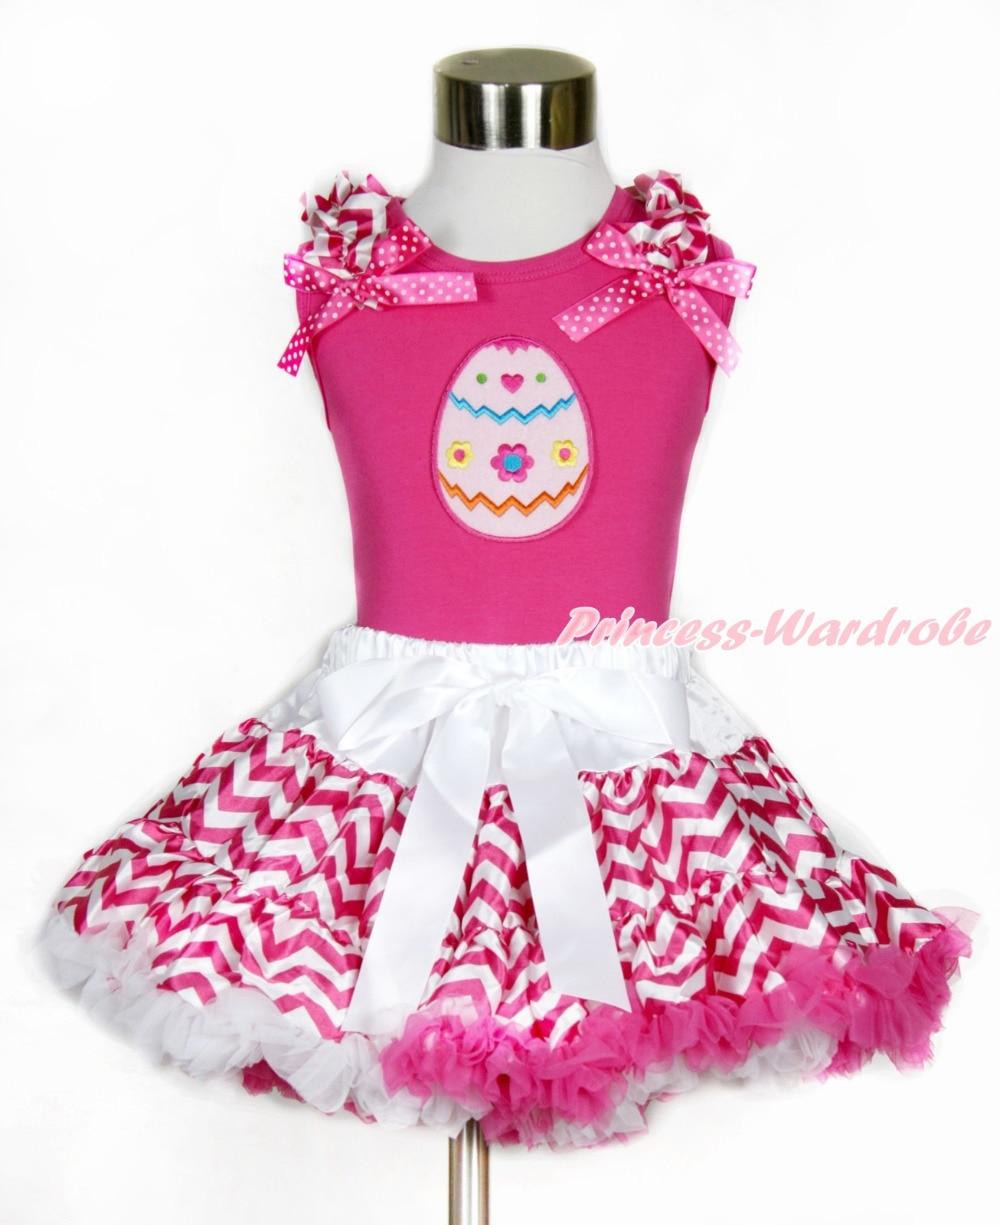 Hot Pink Tank Top, Hot Pink White Wave Ruffles Hot Pink White Dot Bow, Easter Egg Print,  Hot Pink White Wave Pettiskirt MAMH144 easter bow bunny pink white dots top dot waist rainbow girl pettiskirt set 1 8y mapsa0428